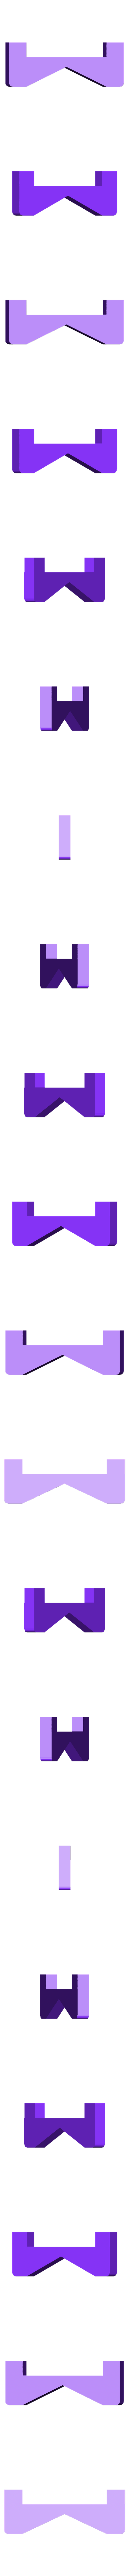 Cryptex_locking_ring-tool.stl Télécharger fichier STL gratuit Stepper (en cliquant) Cryptex • Design à imprimer en 3D, c47